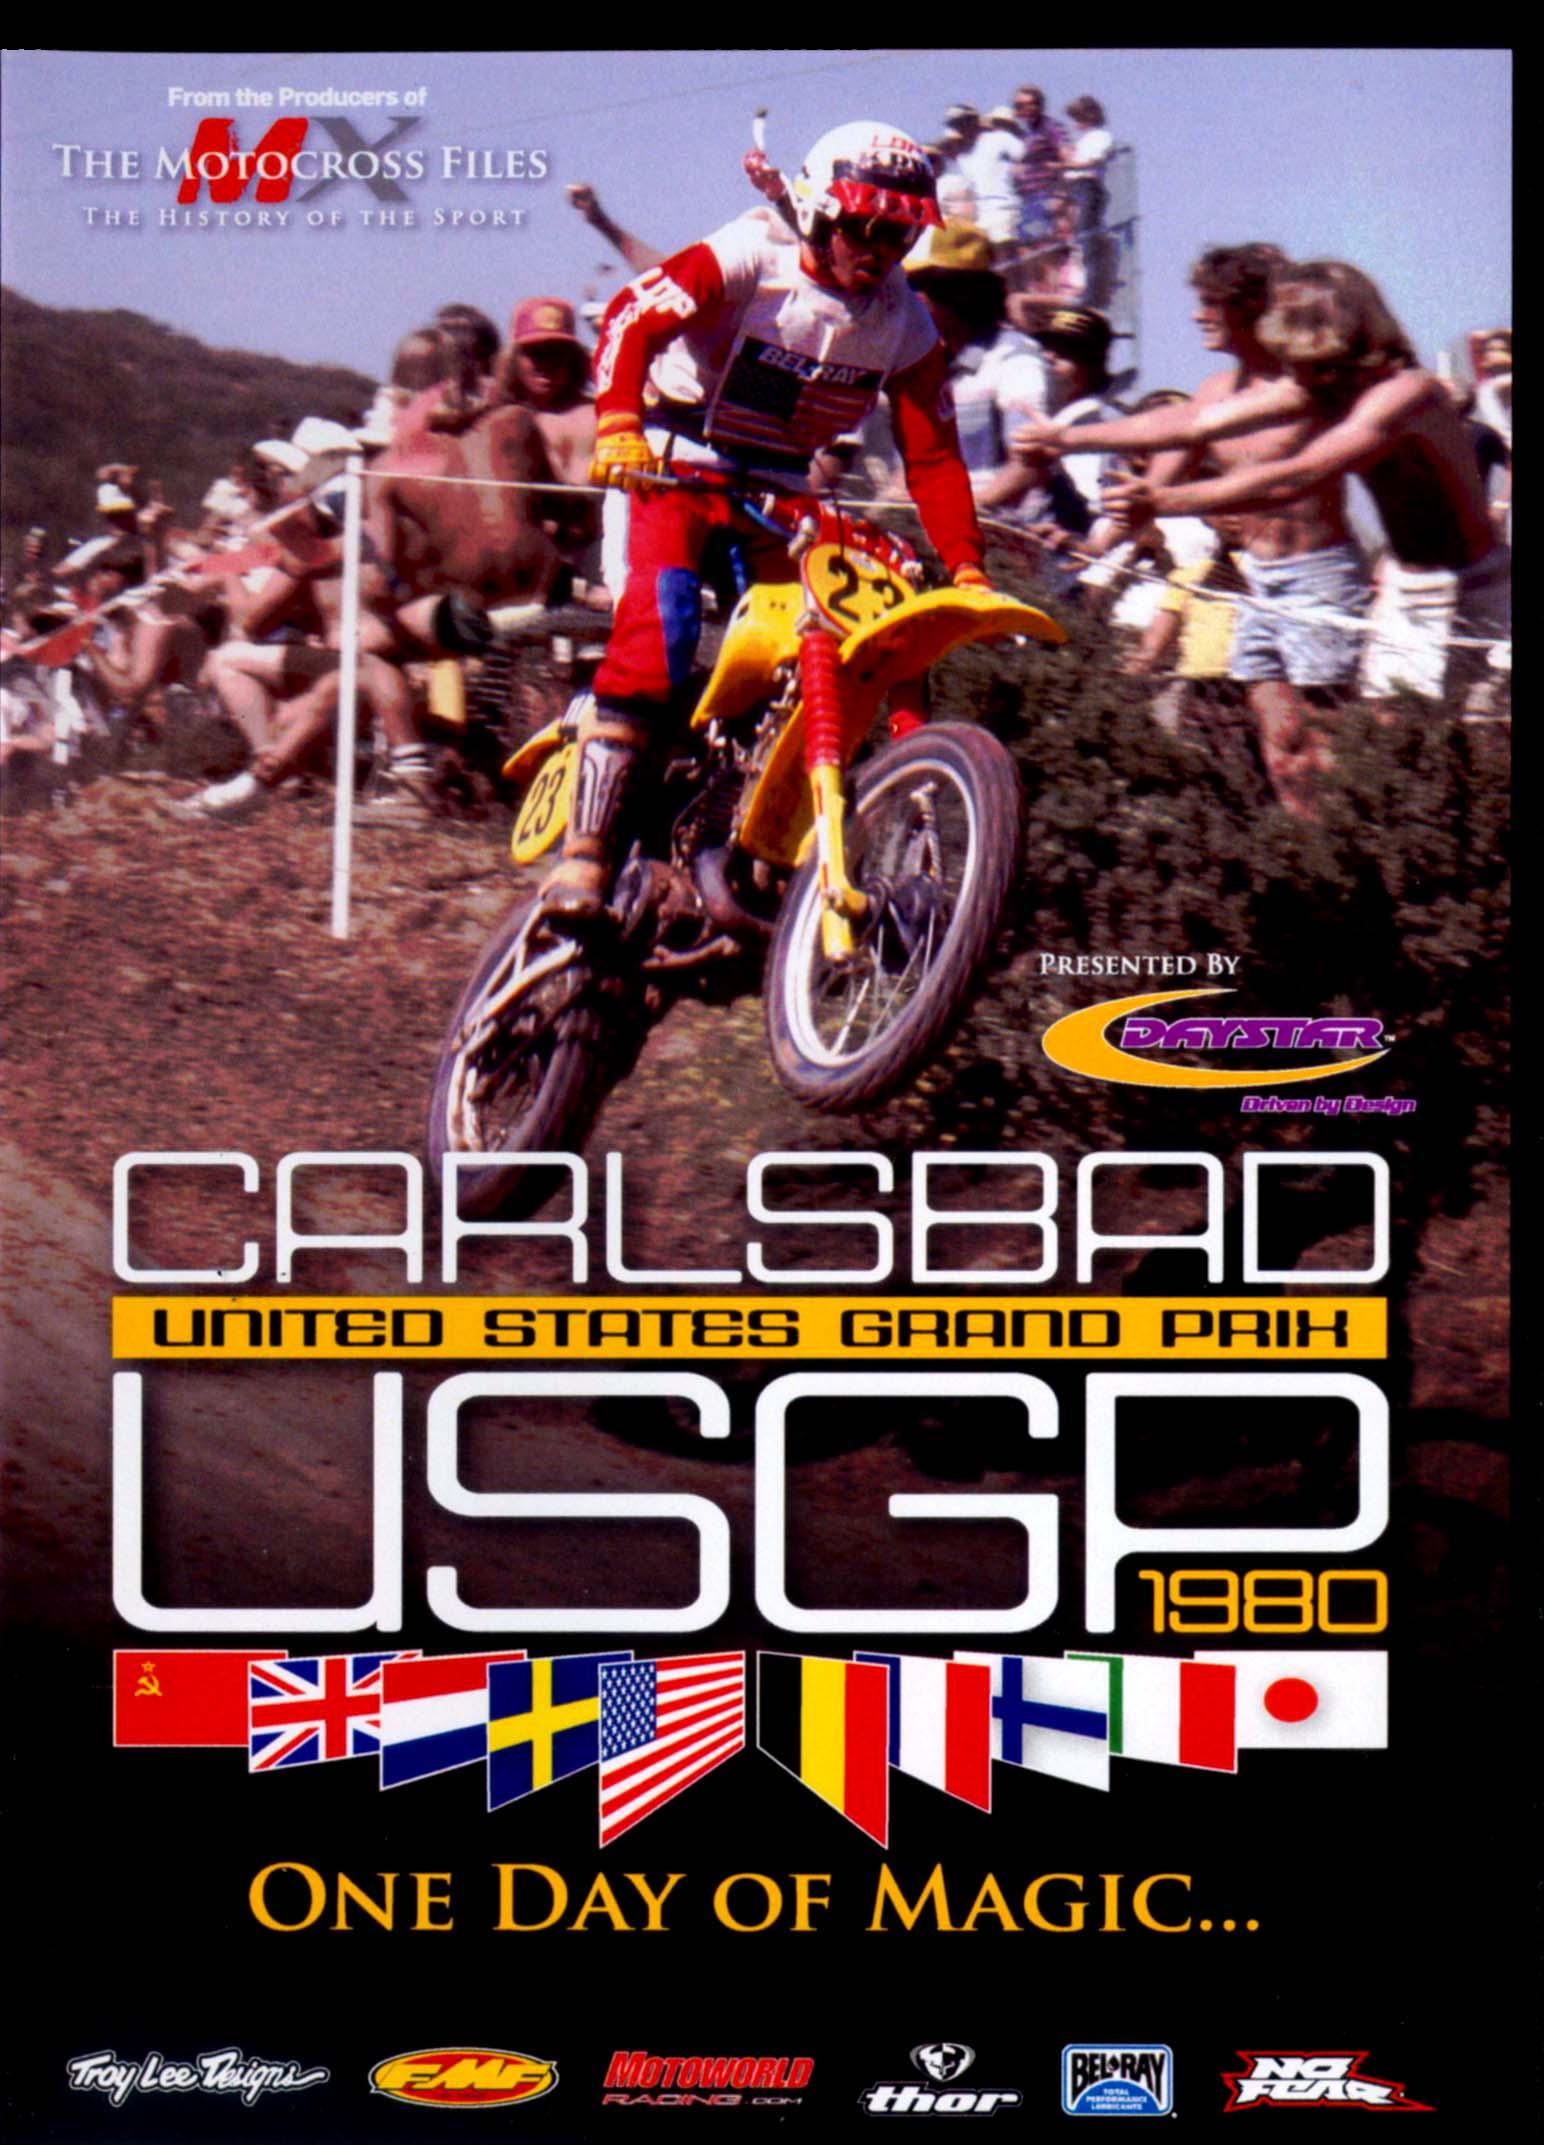 The Carlsbad USGP 1980